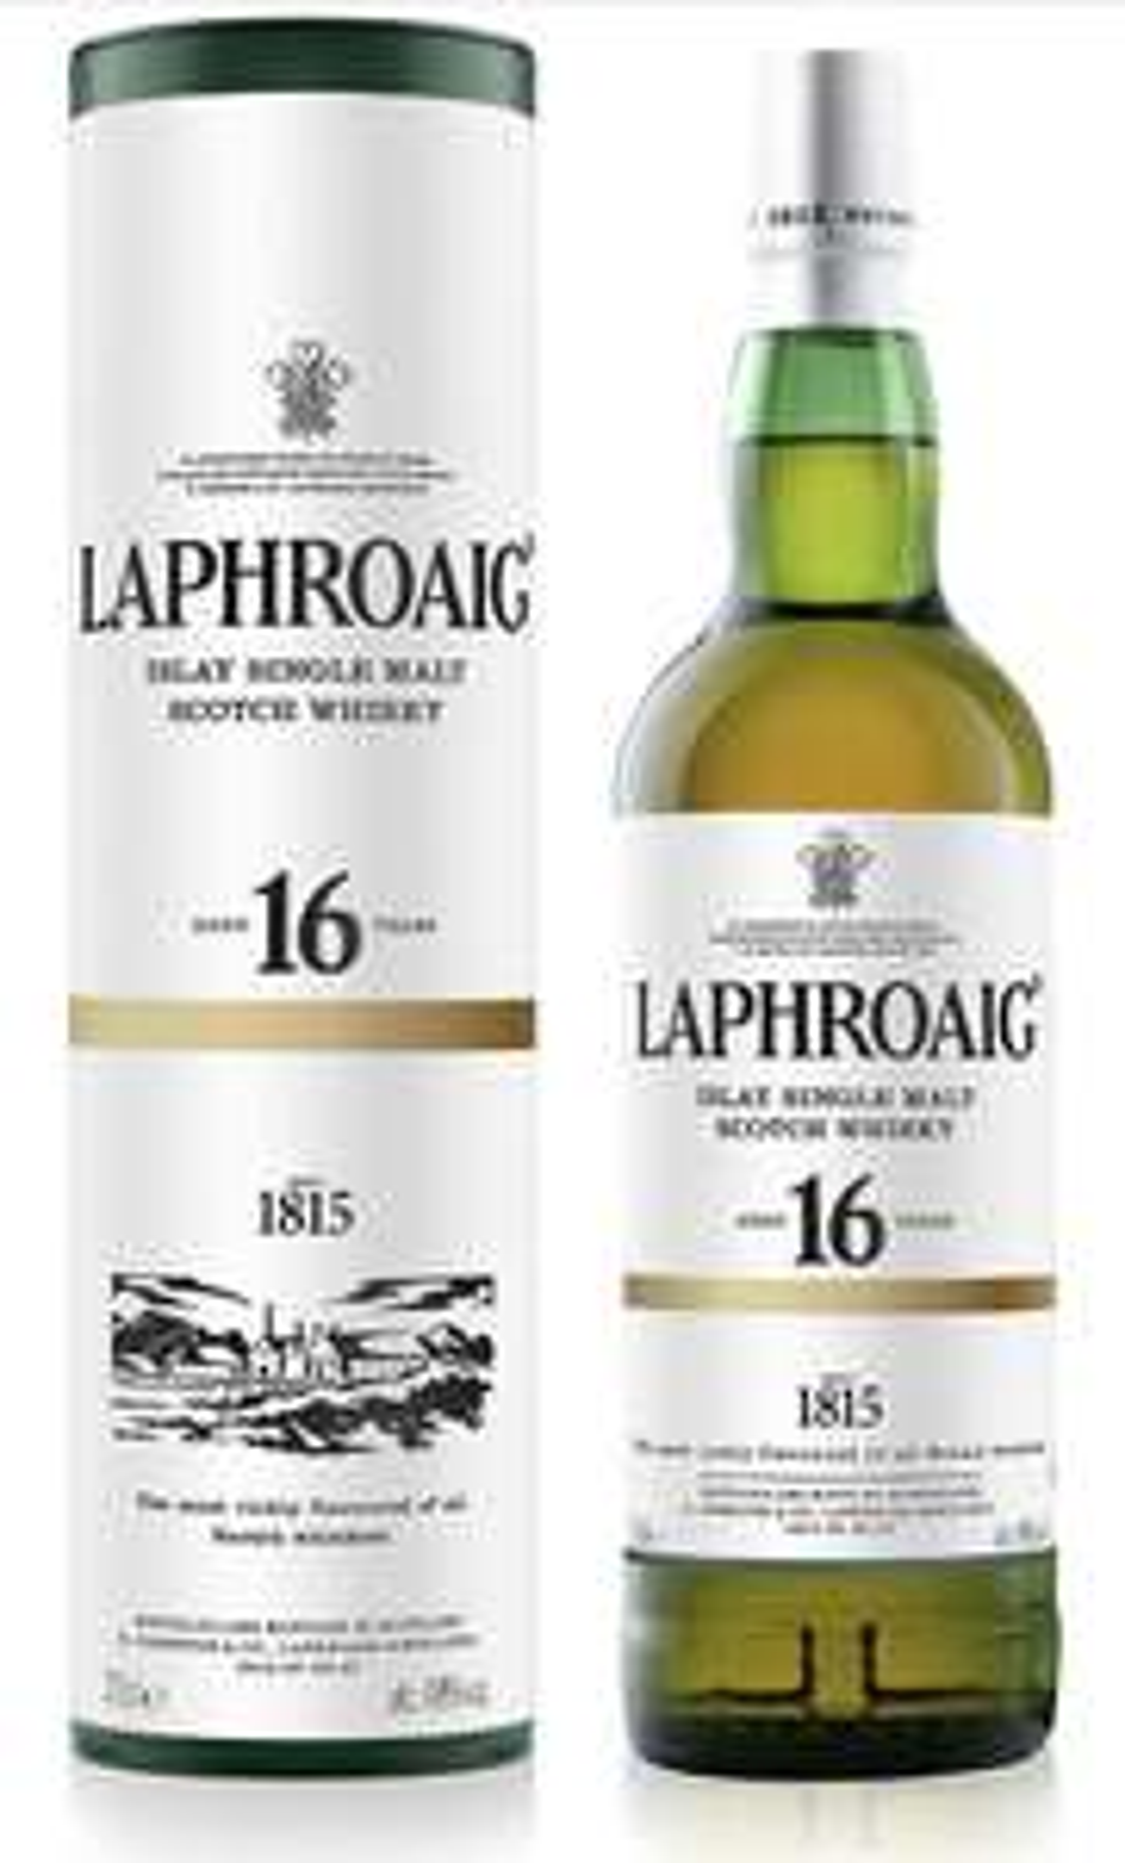 Laphroaig 16 Jahre Single Malt Whisky 48% Vol, 1 x 0,7l